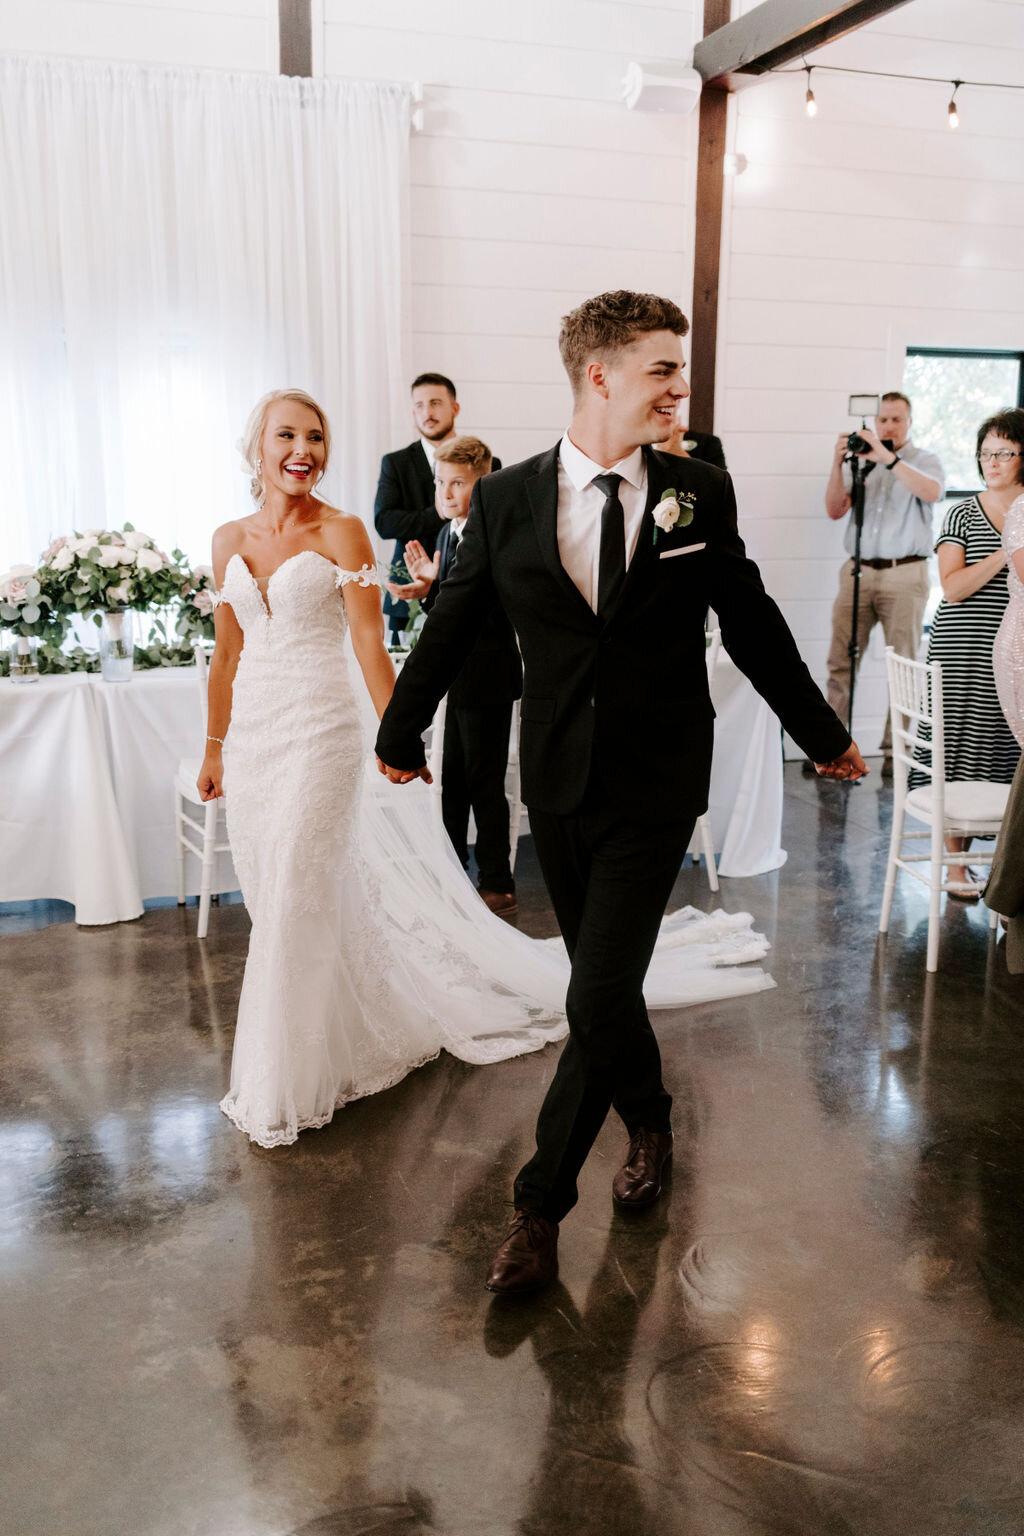 Tulsa White Barn Wedding Venue Outdoor Ceremony 119.jpg